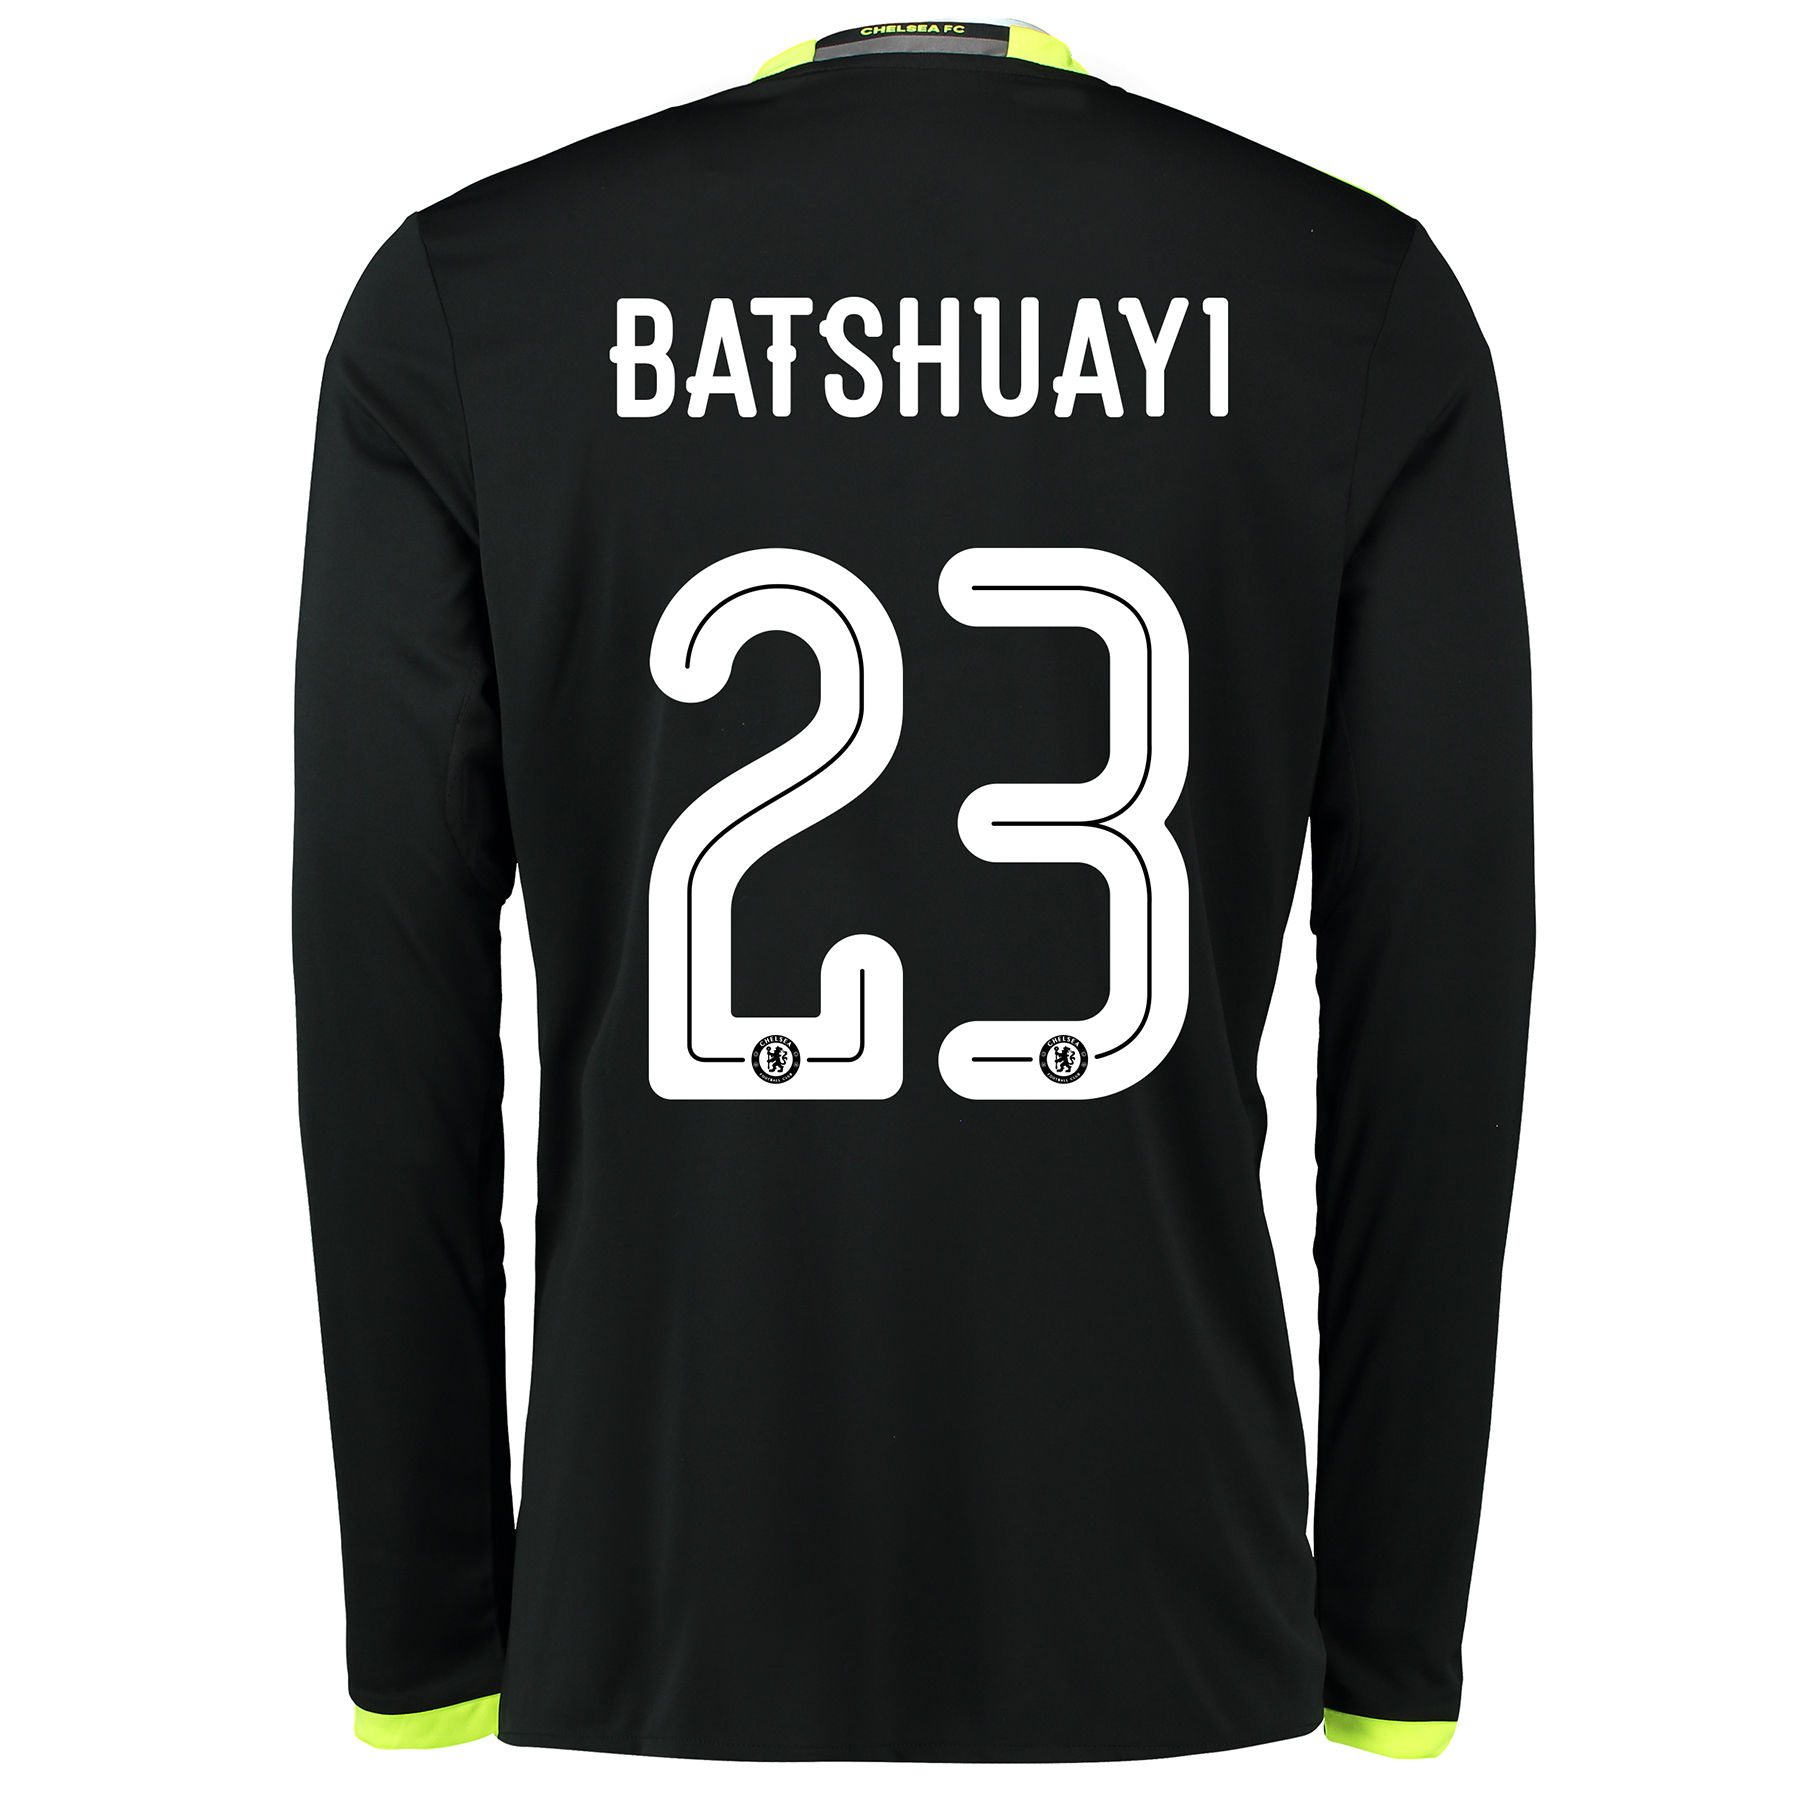 Chelsea Linear Away Shirt 16-17 - Kids - Long Sleeve with Batshuayi 23